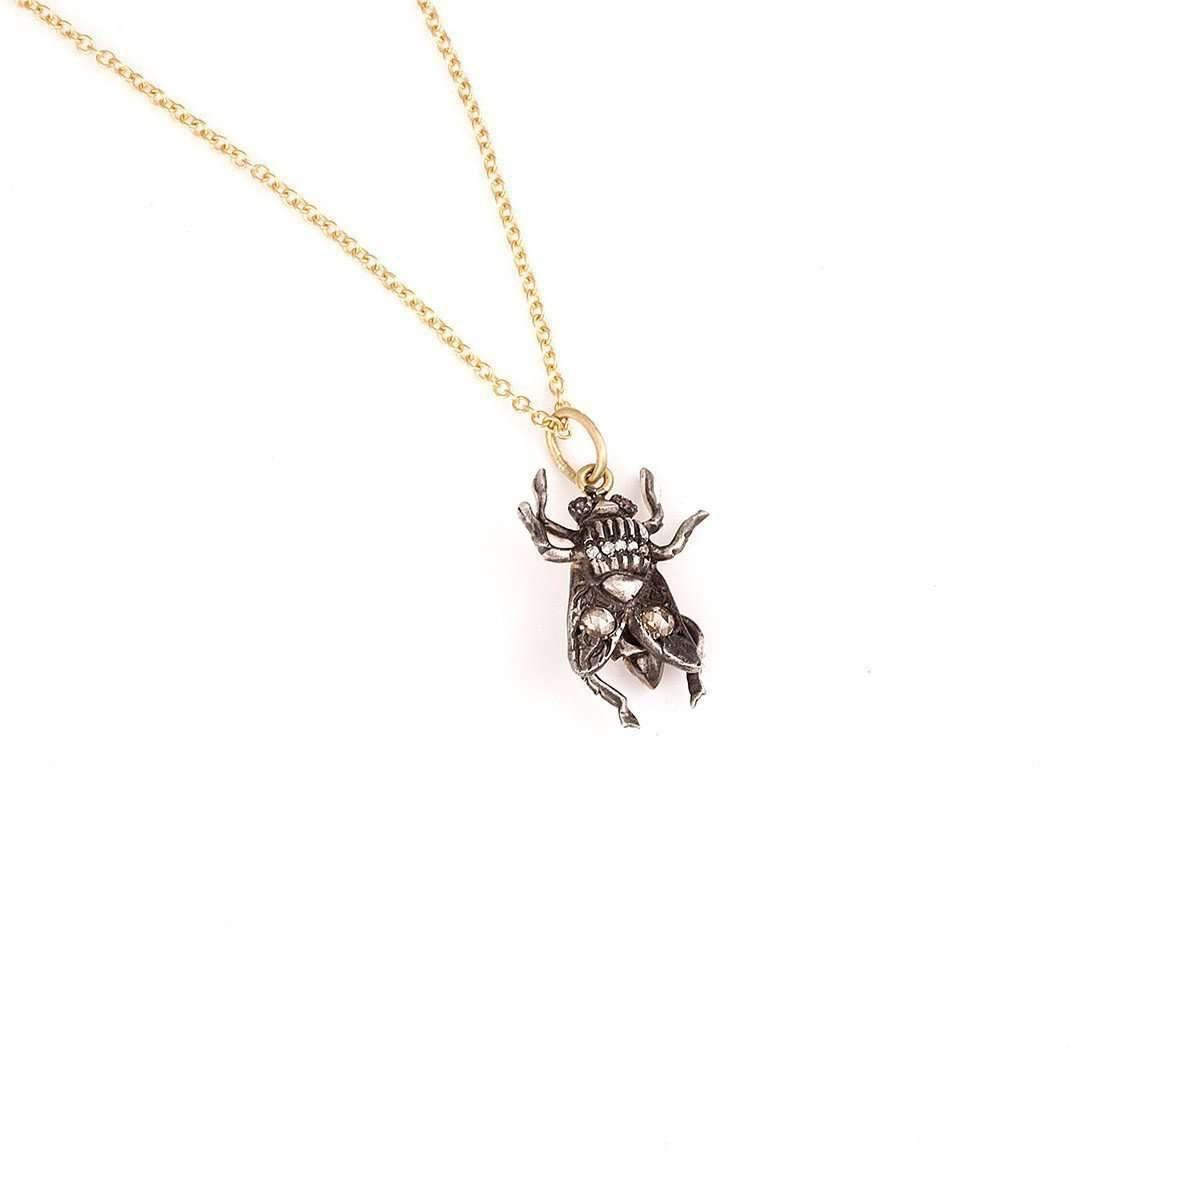 Sylva & Cie. Fly Pendant with Chain IvYyI3b3j